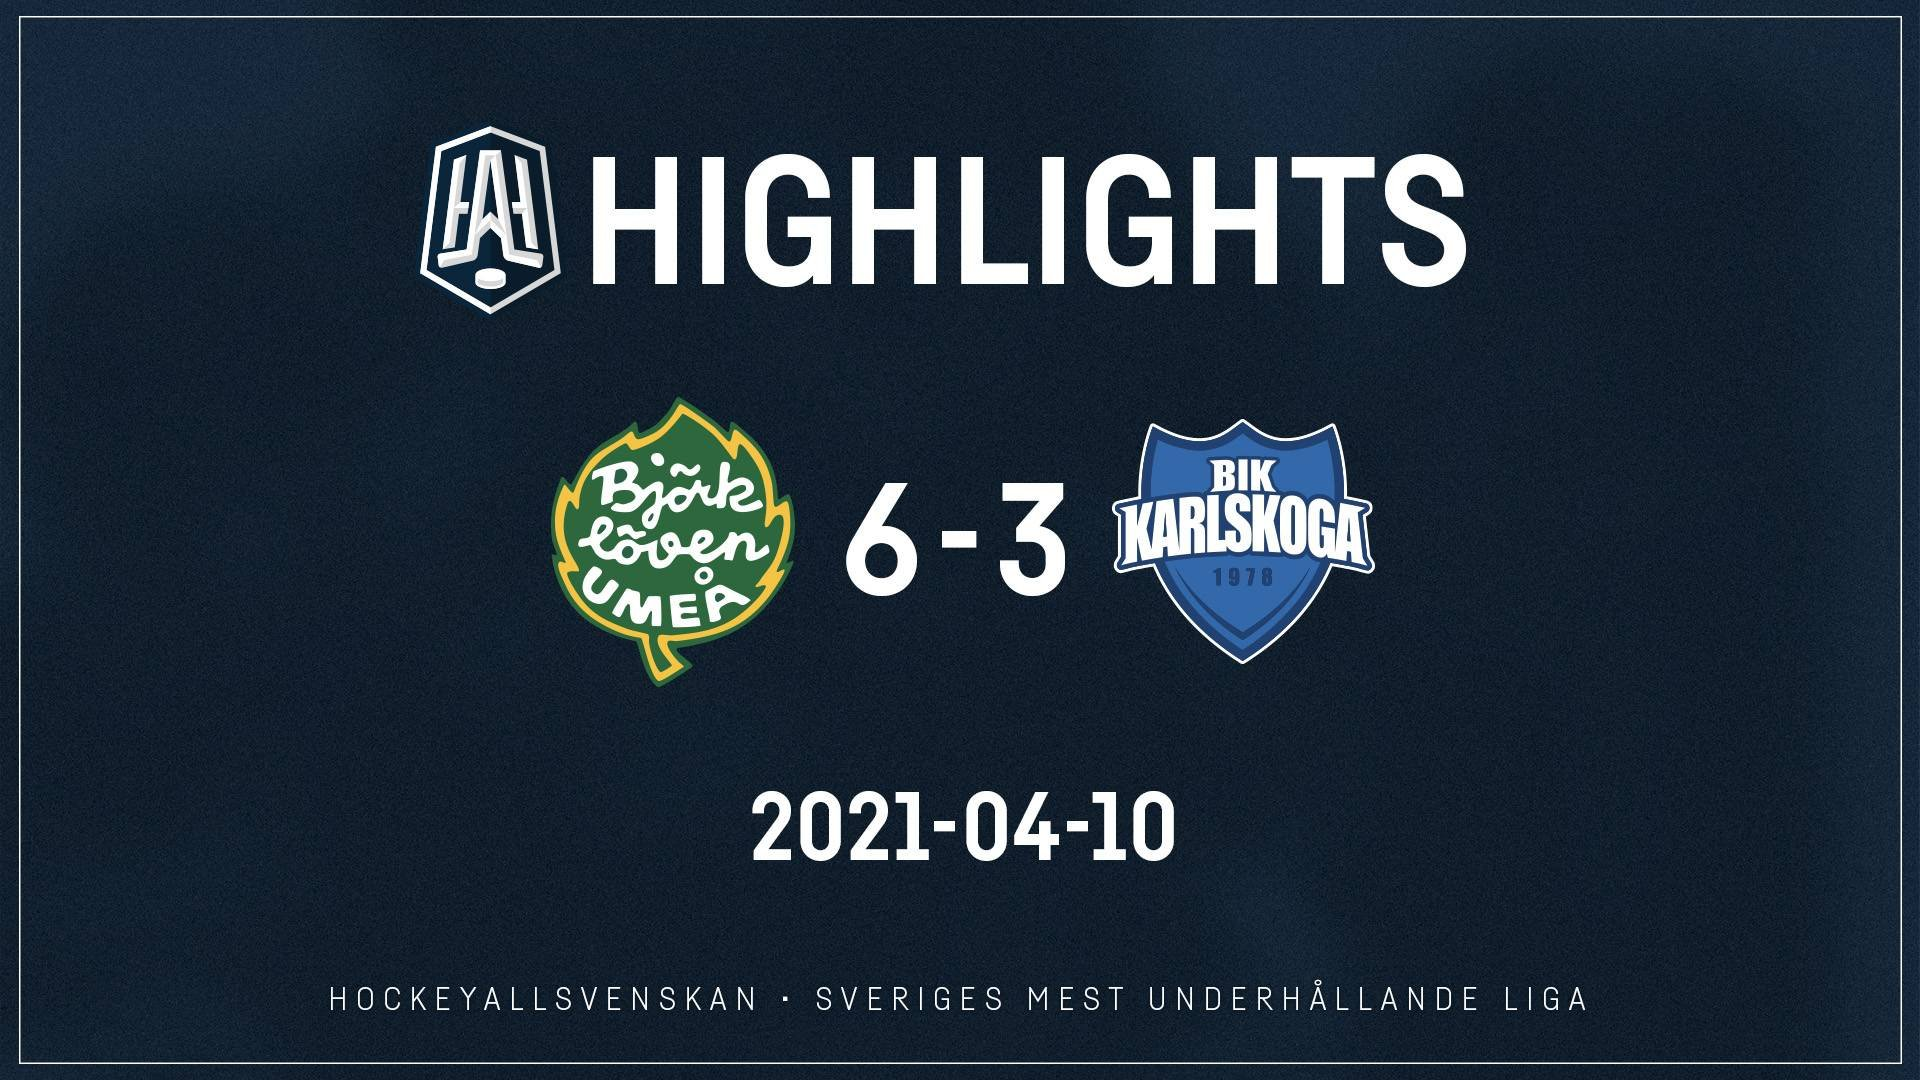 2021-04-10 Björklöven - Karlskoga 6-3